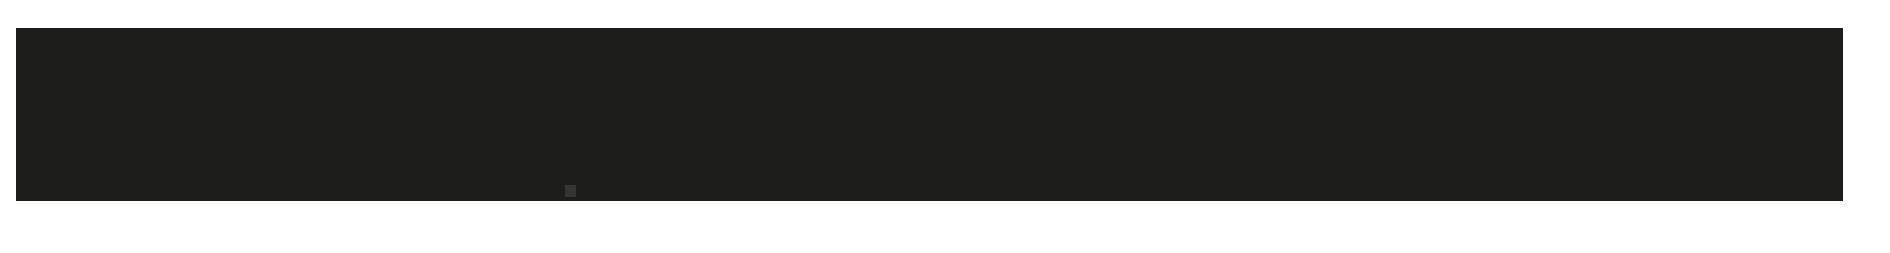 GLS.GALLERY Logo